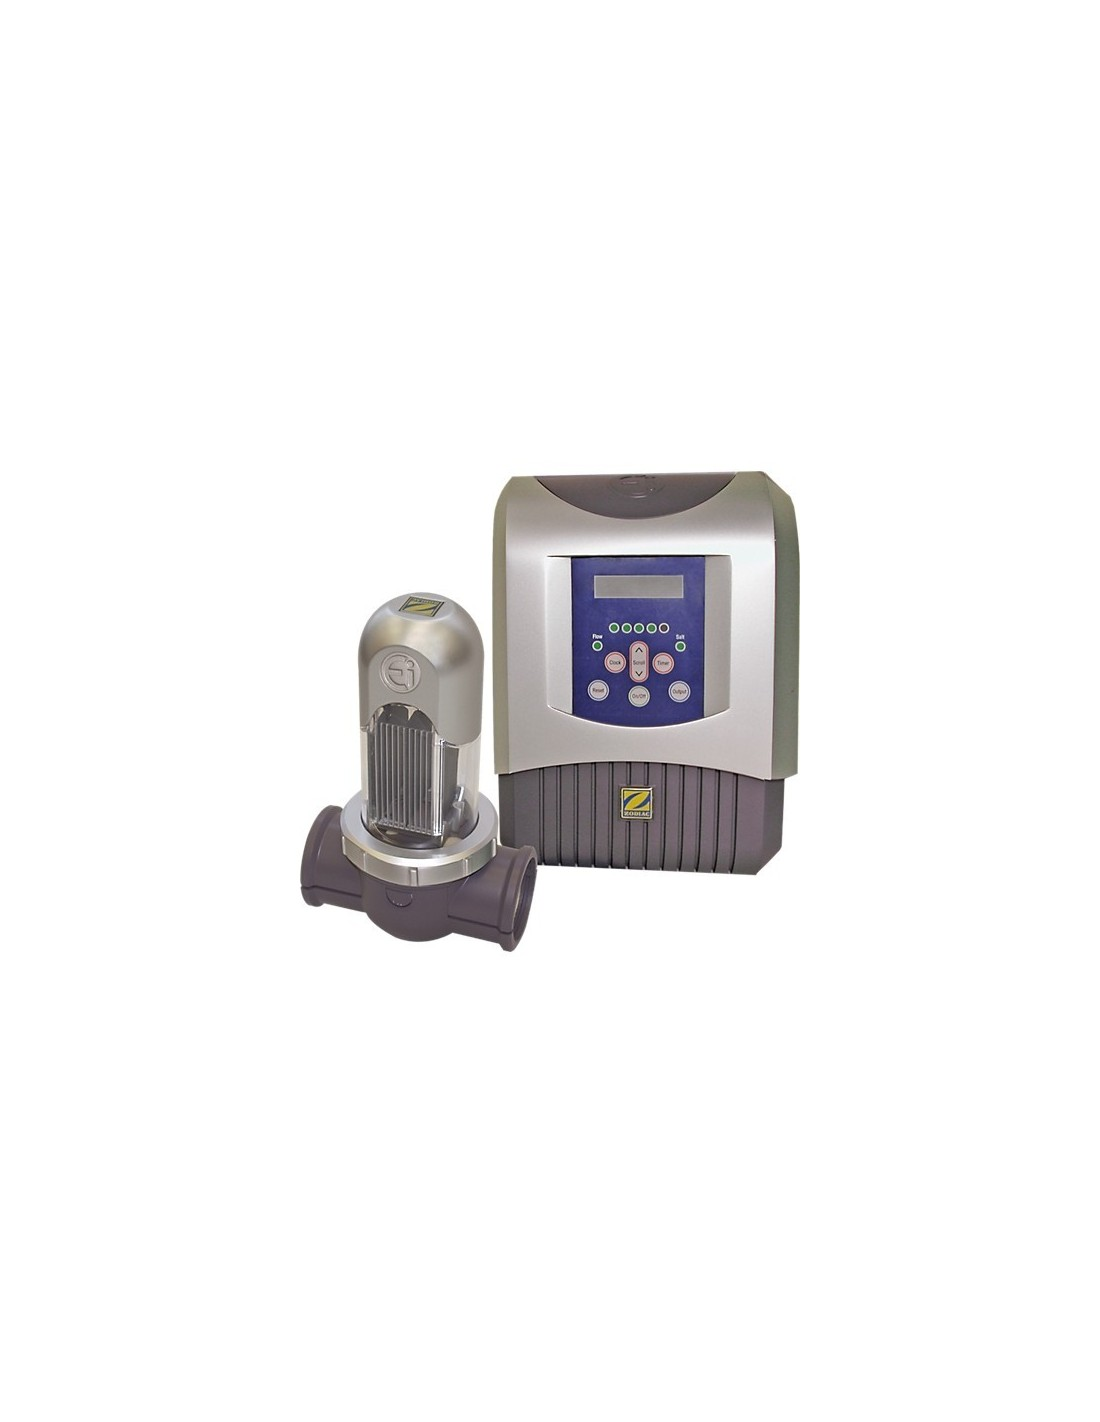 Electrolyseur au sel auto-nettoyant 90m3